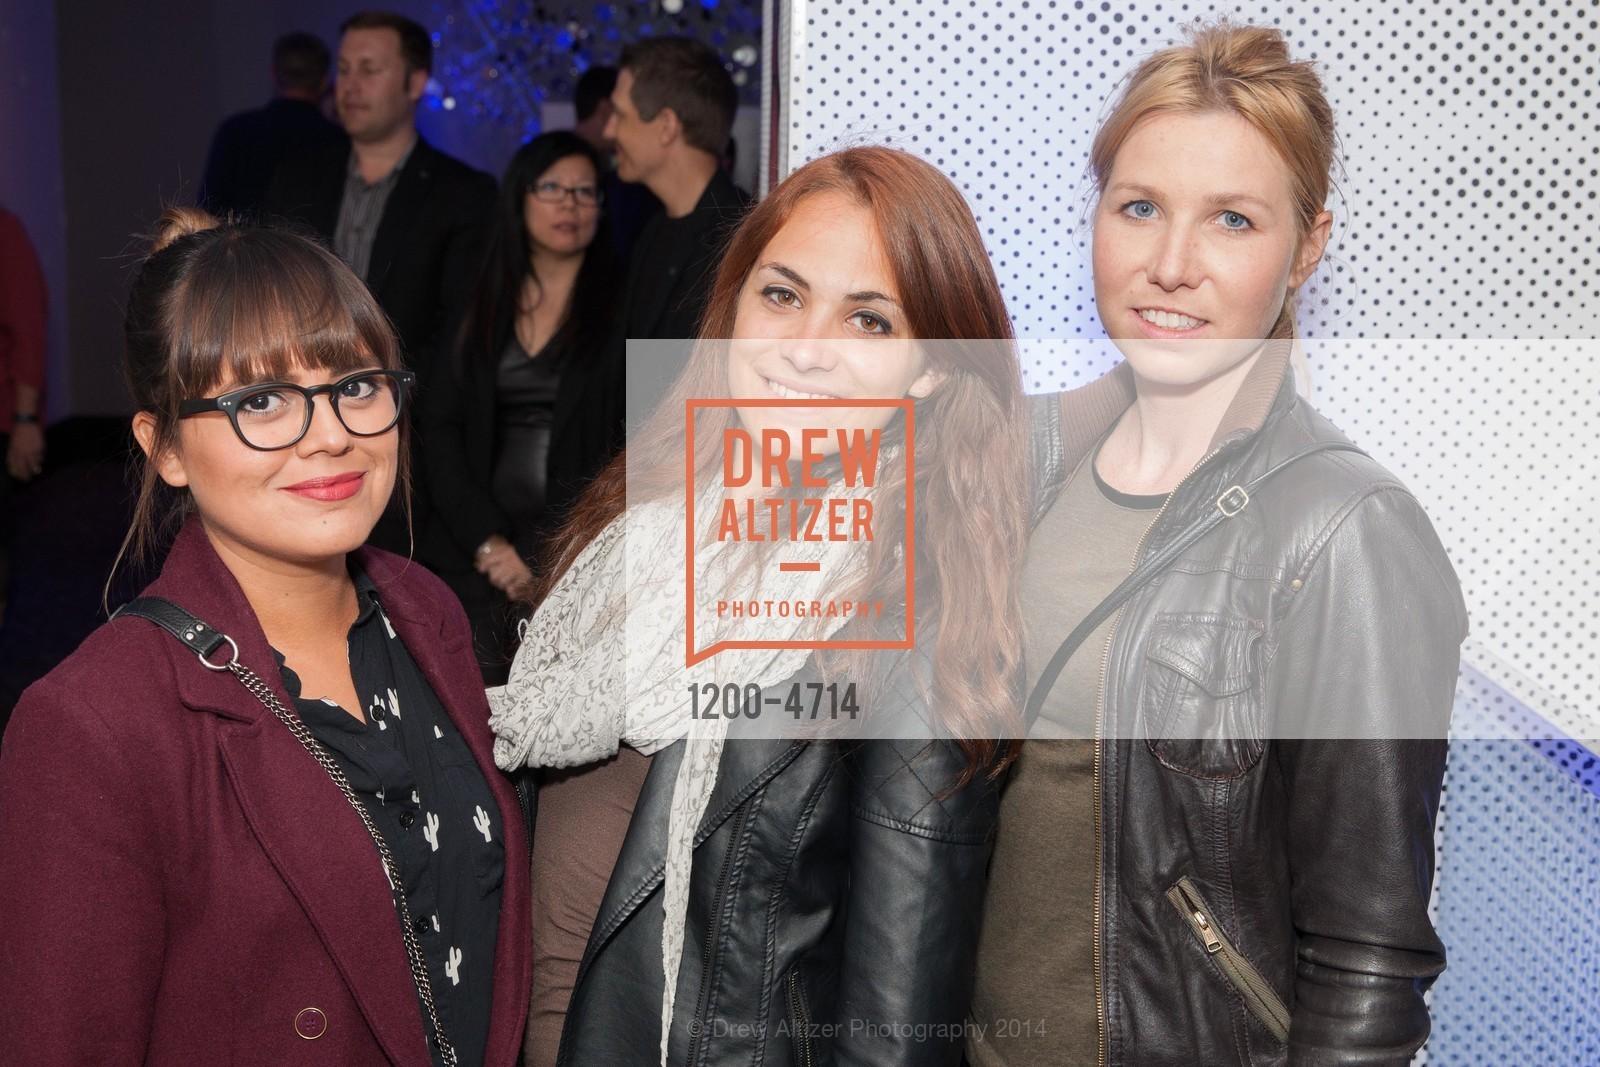 Grace Ponce, Annamaria Almasio, Kasia Cawlicka, Photo #1200-4714